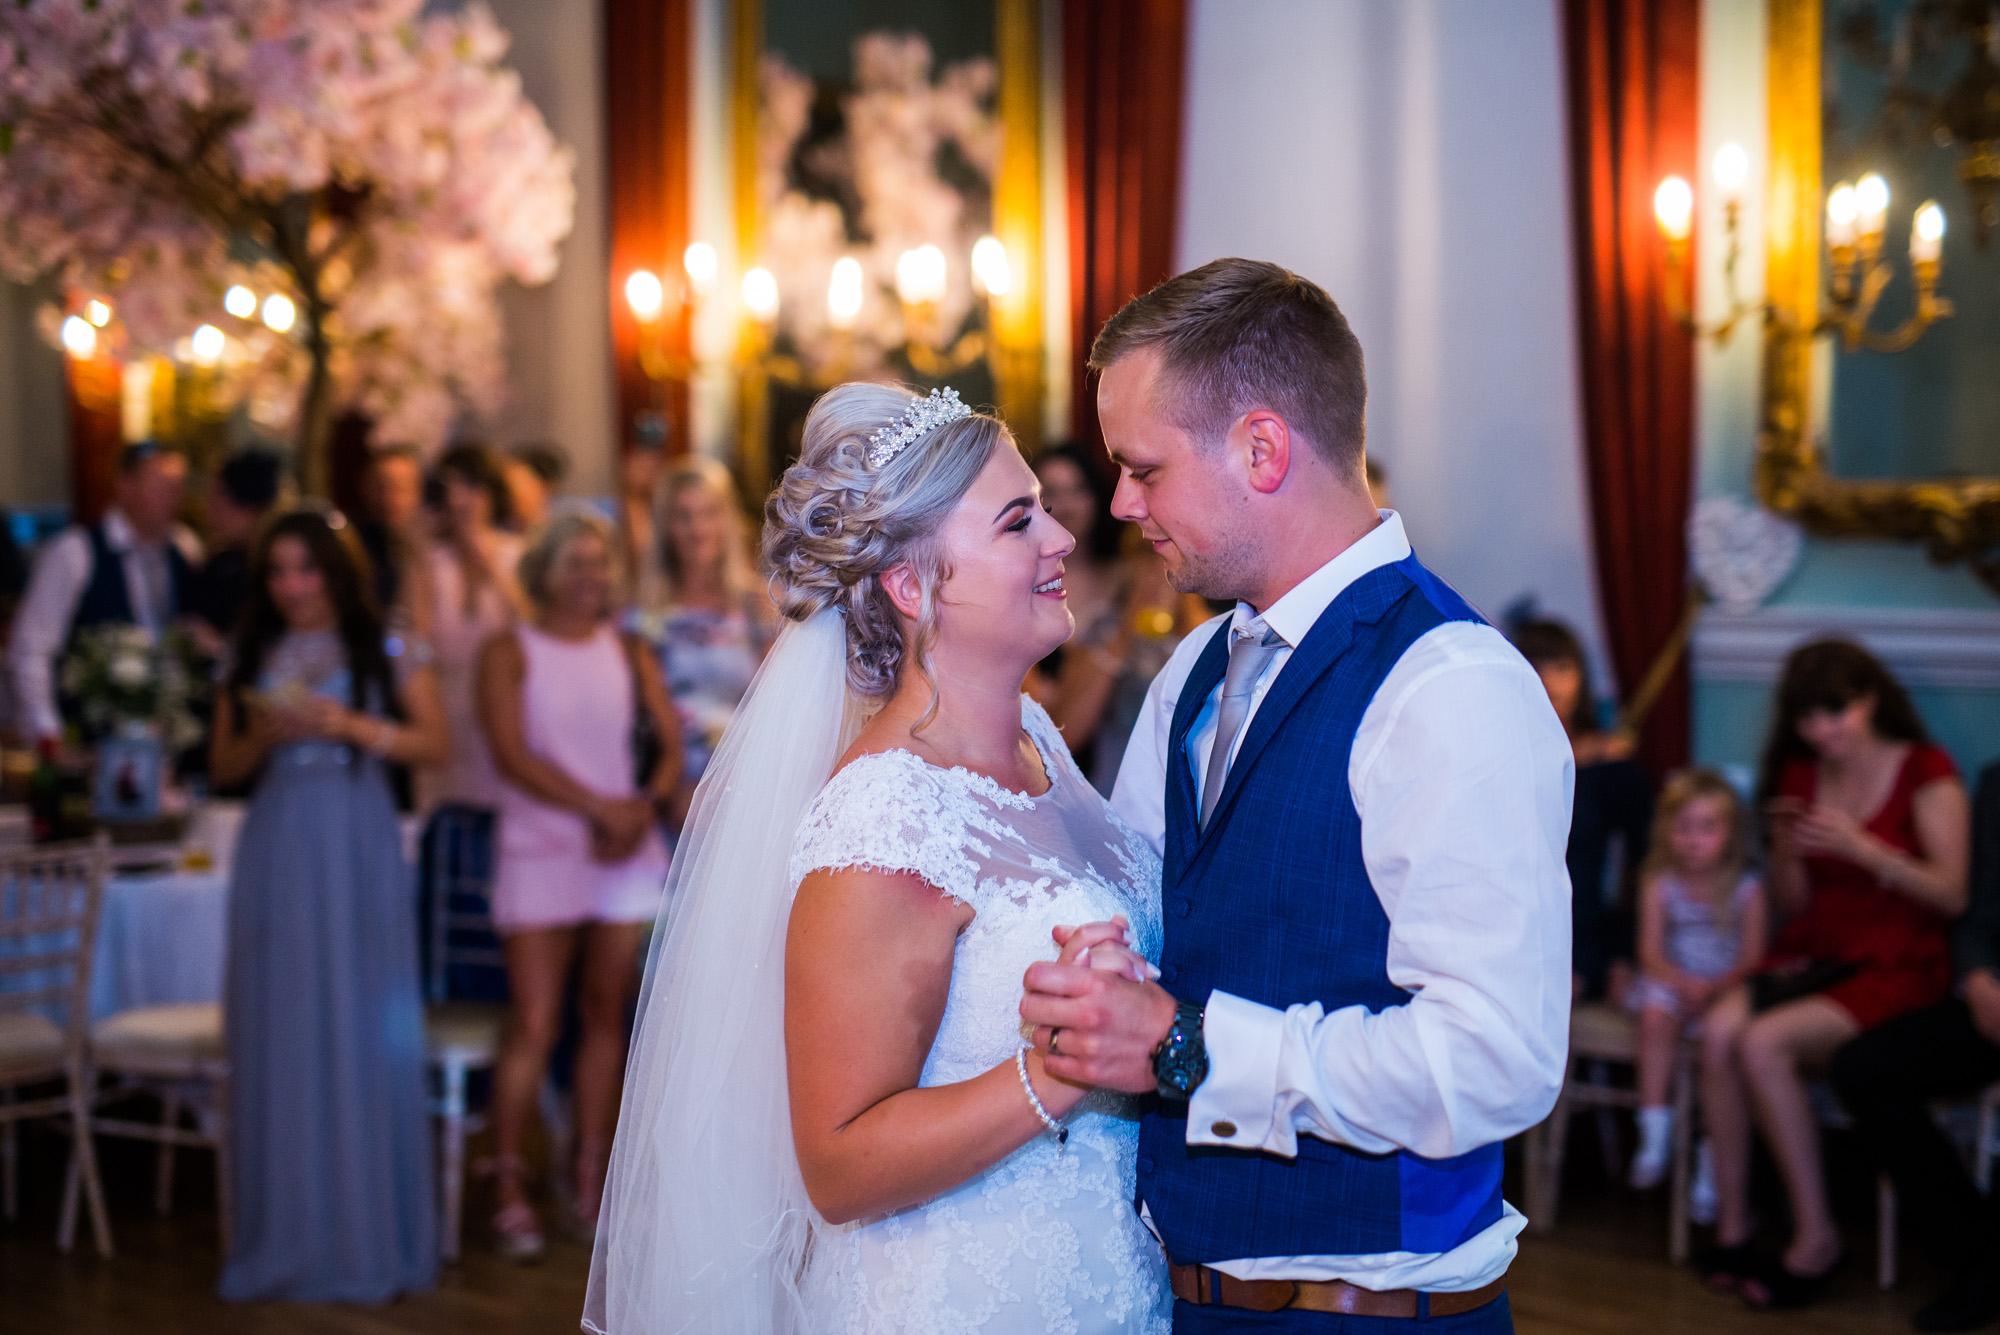 Savannah and Josh wedding photos (343 of 350).jpg